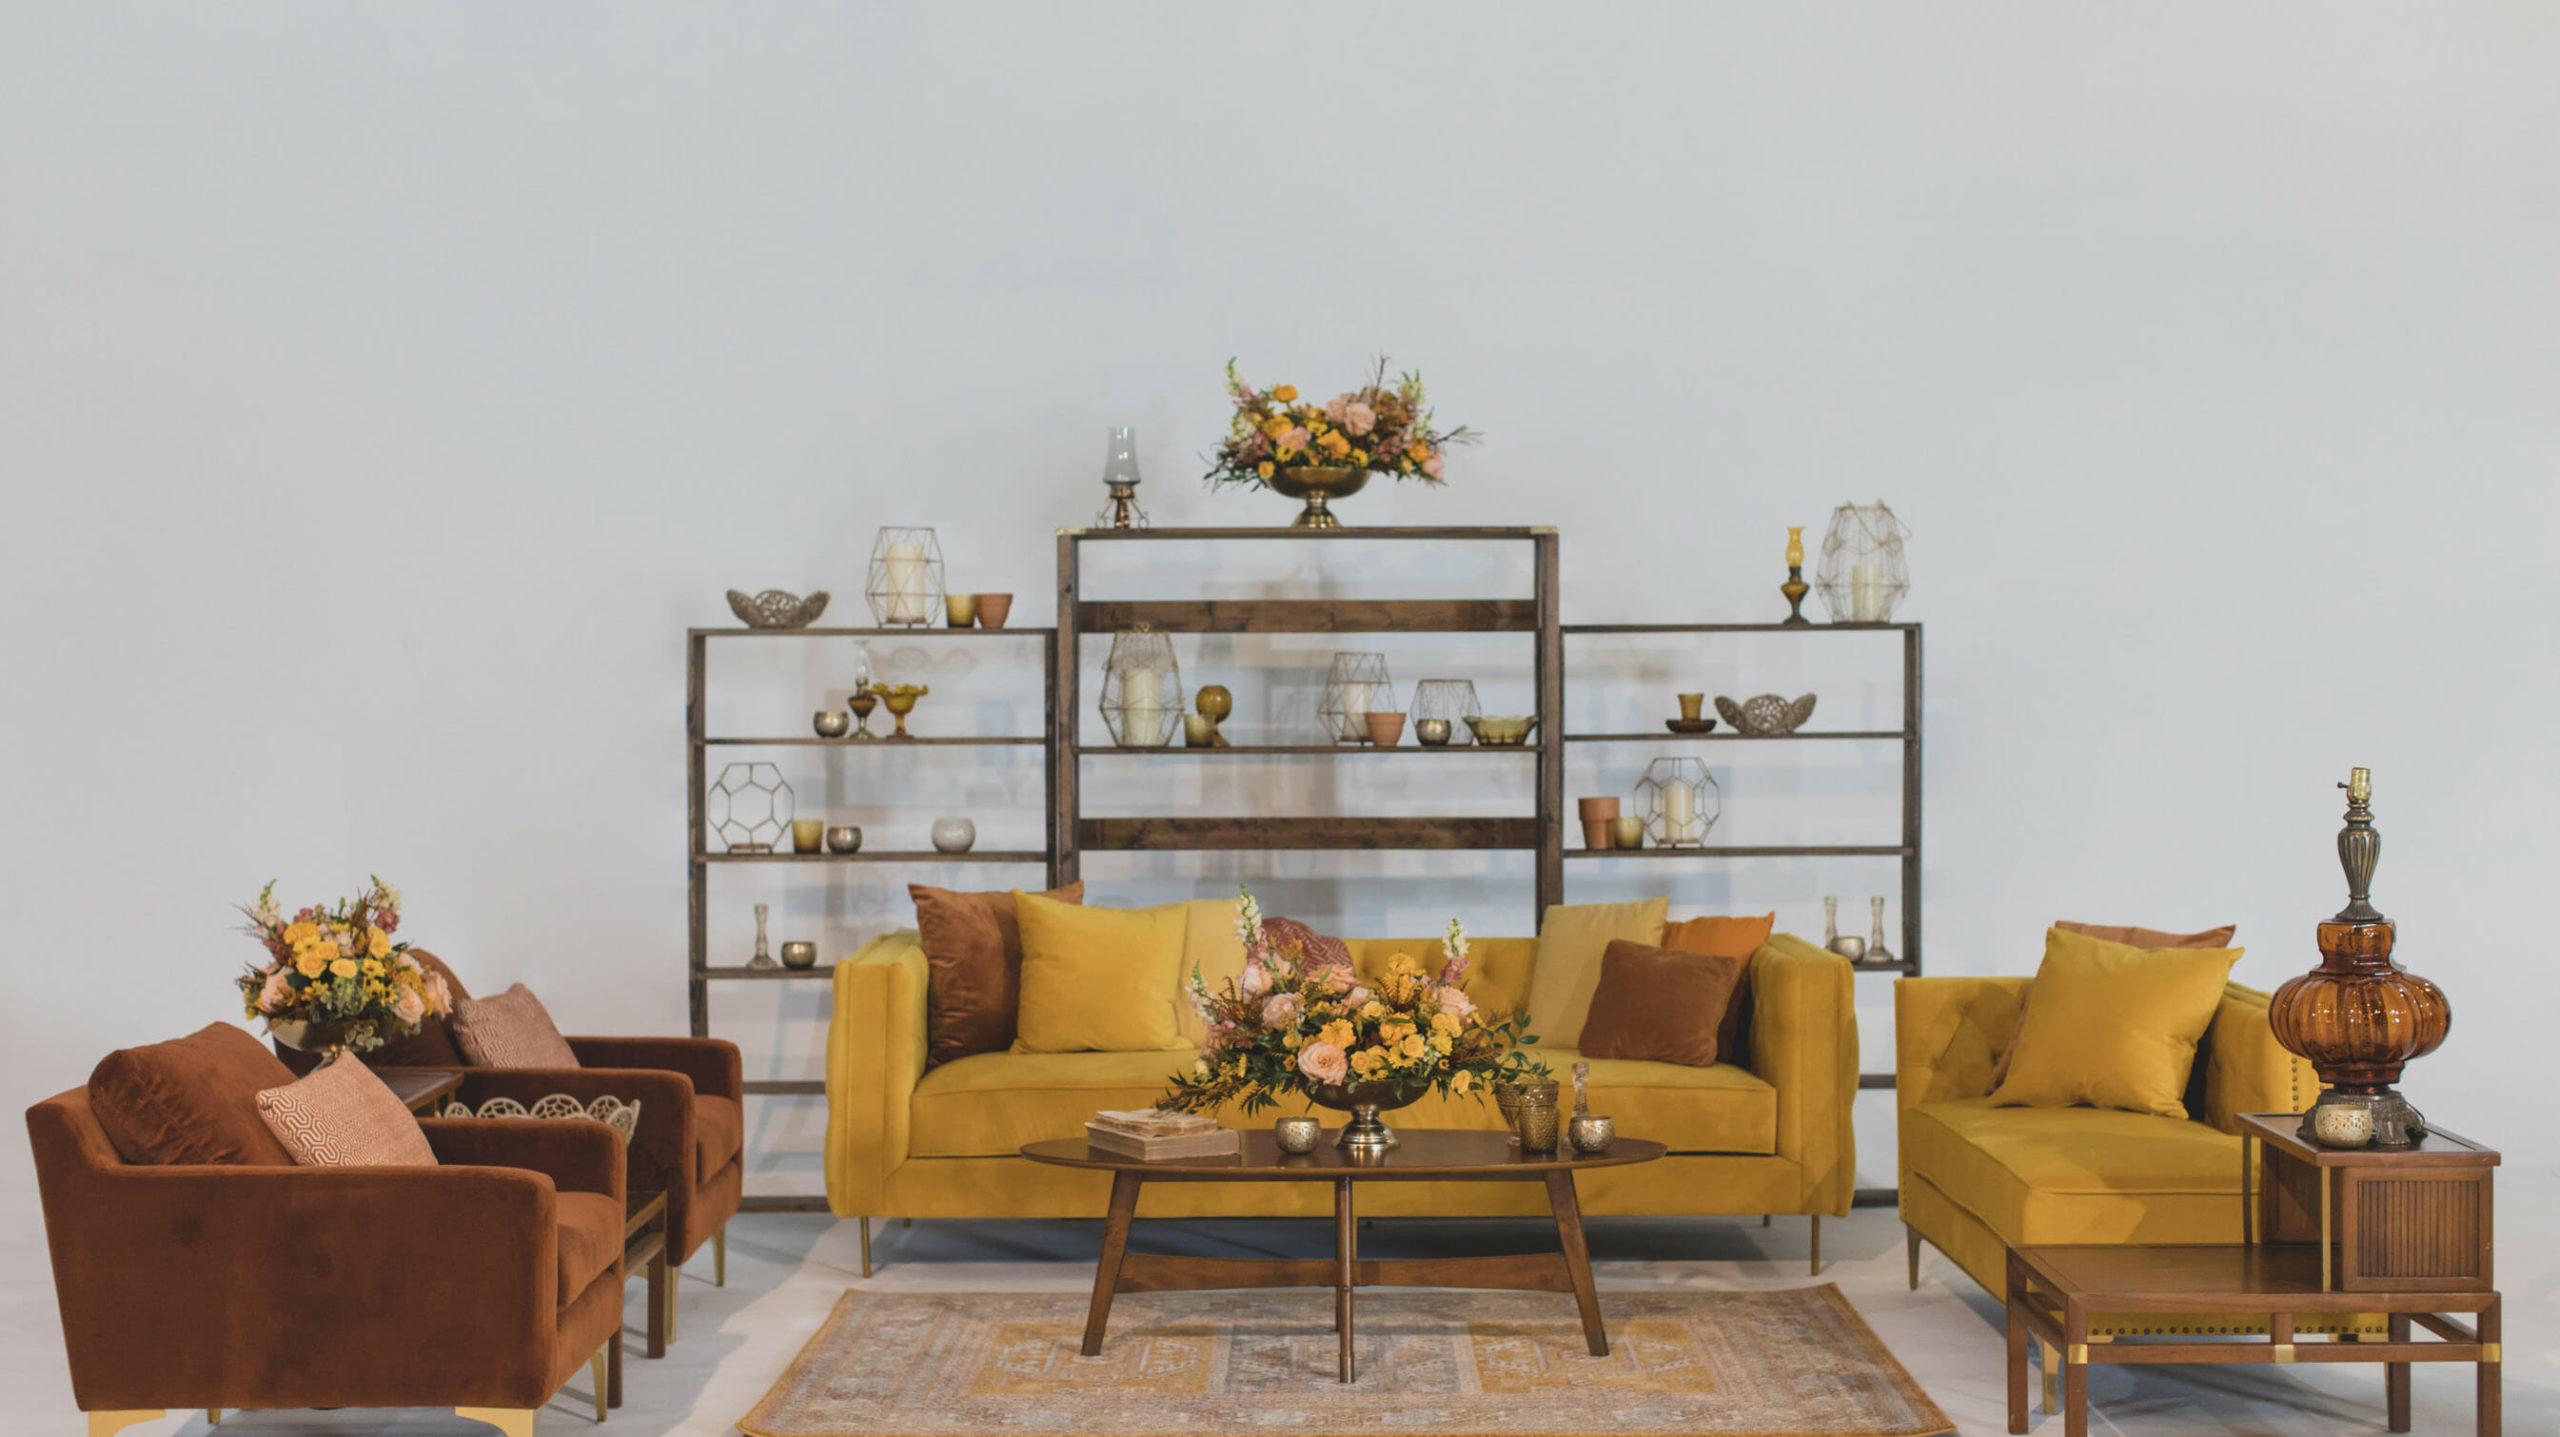 marigold_lounge_rental_orlando